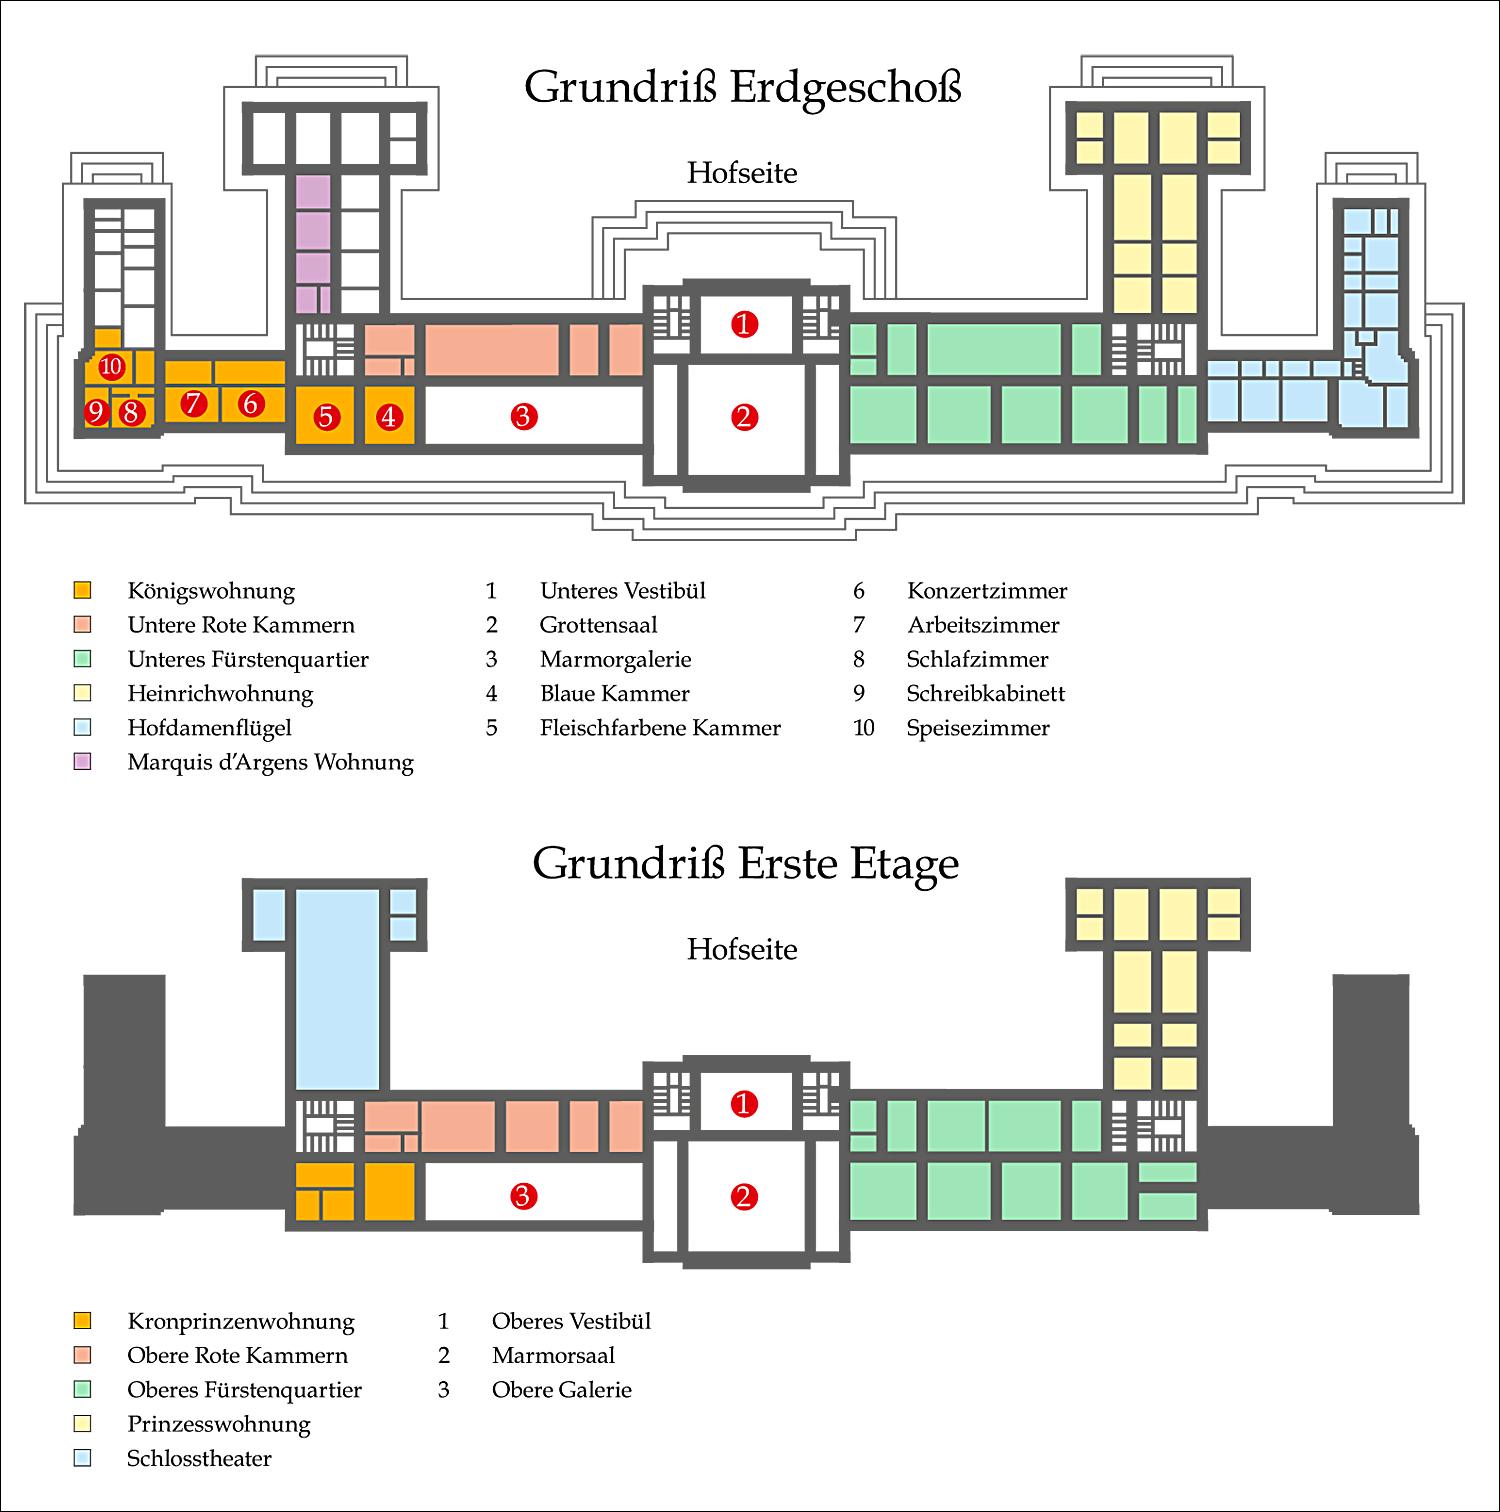 das neue palais pomp ser schlussakkord des barock. Black Bedroom Furniture Sets. Home Design Ideas